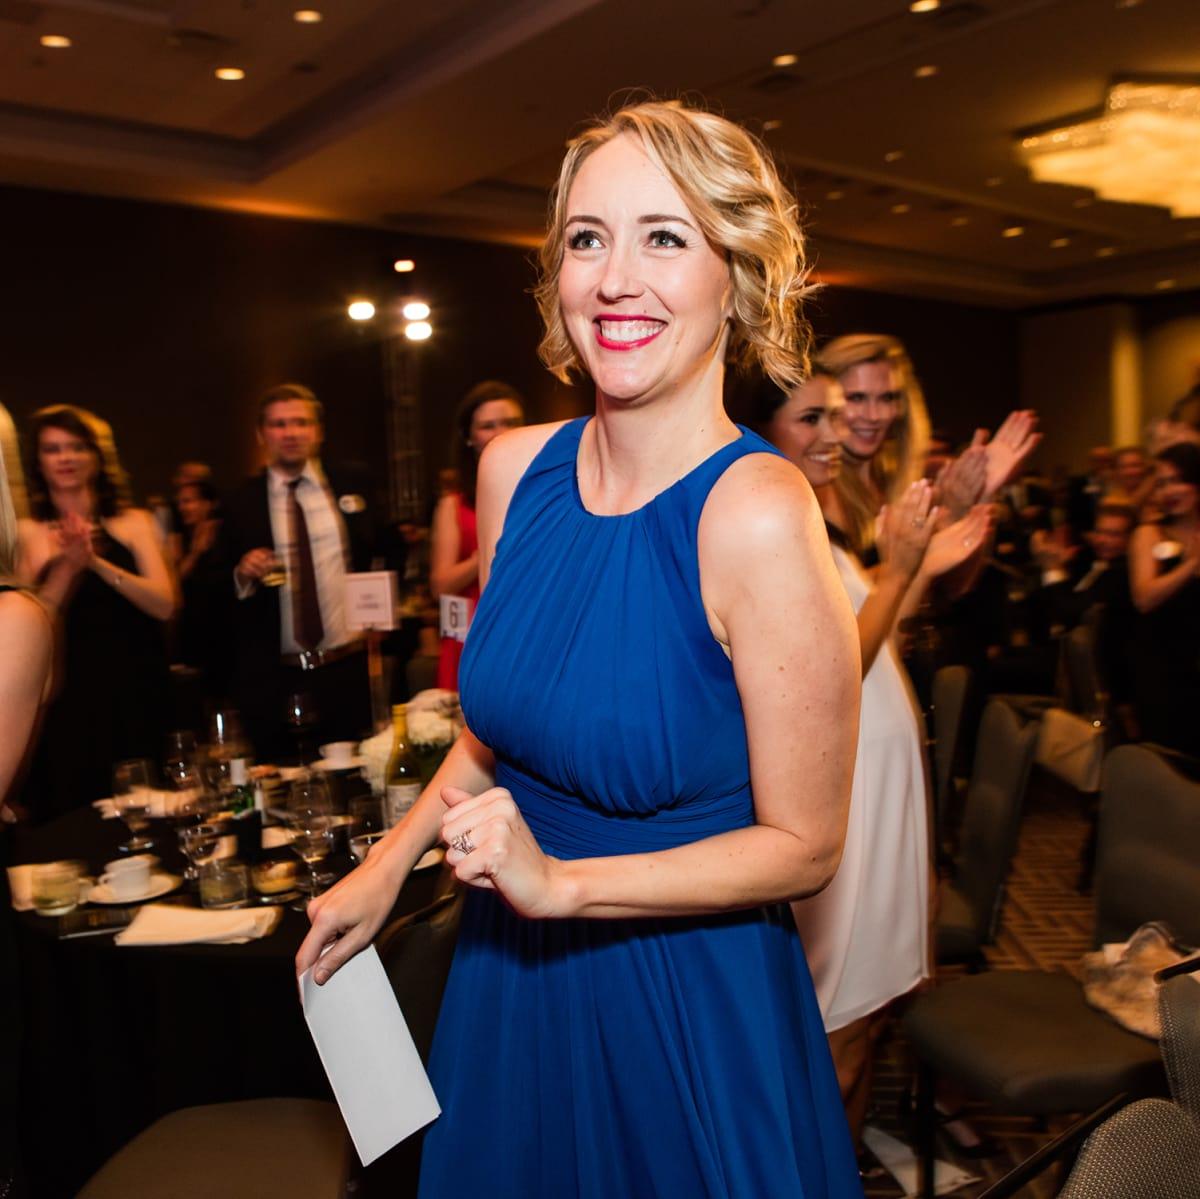 Leukemia & Lymphoma Society's Man and Woman of the Year Grand Finale Gala 2017 Elizabeth King